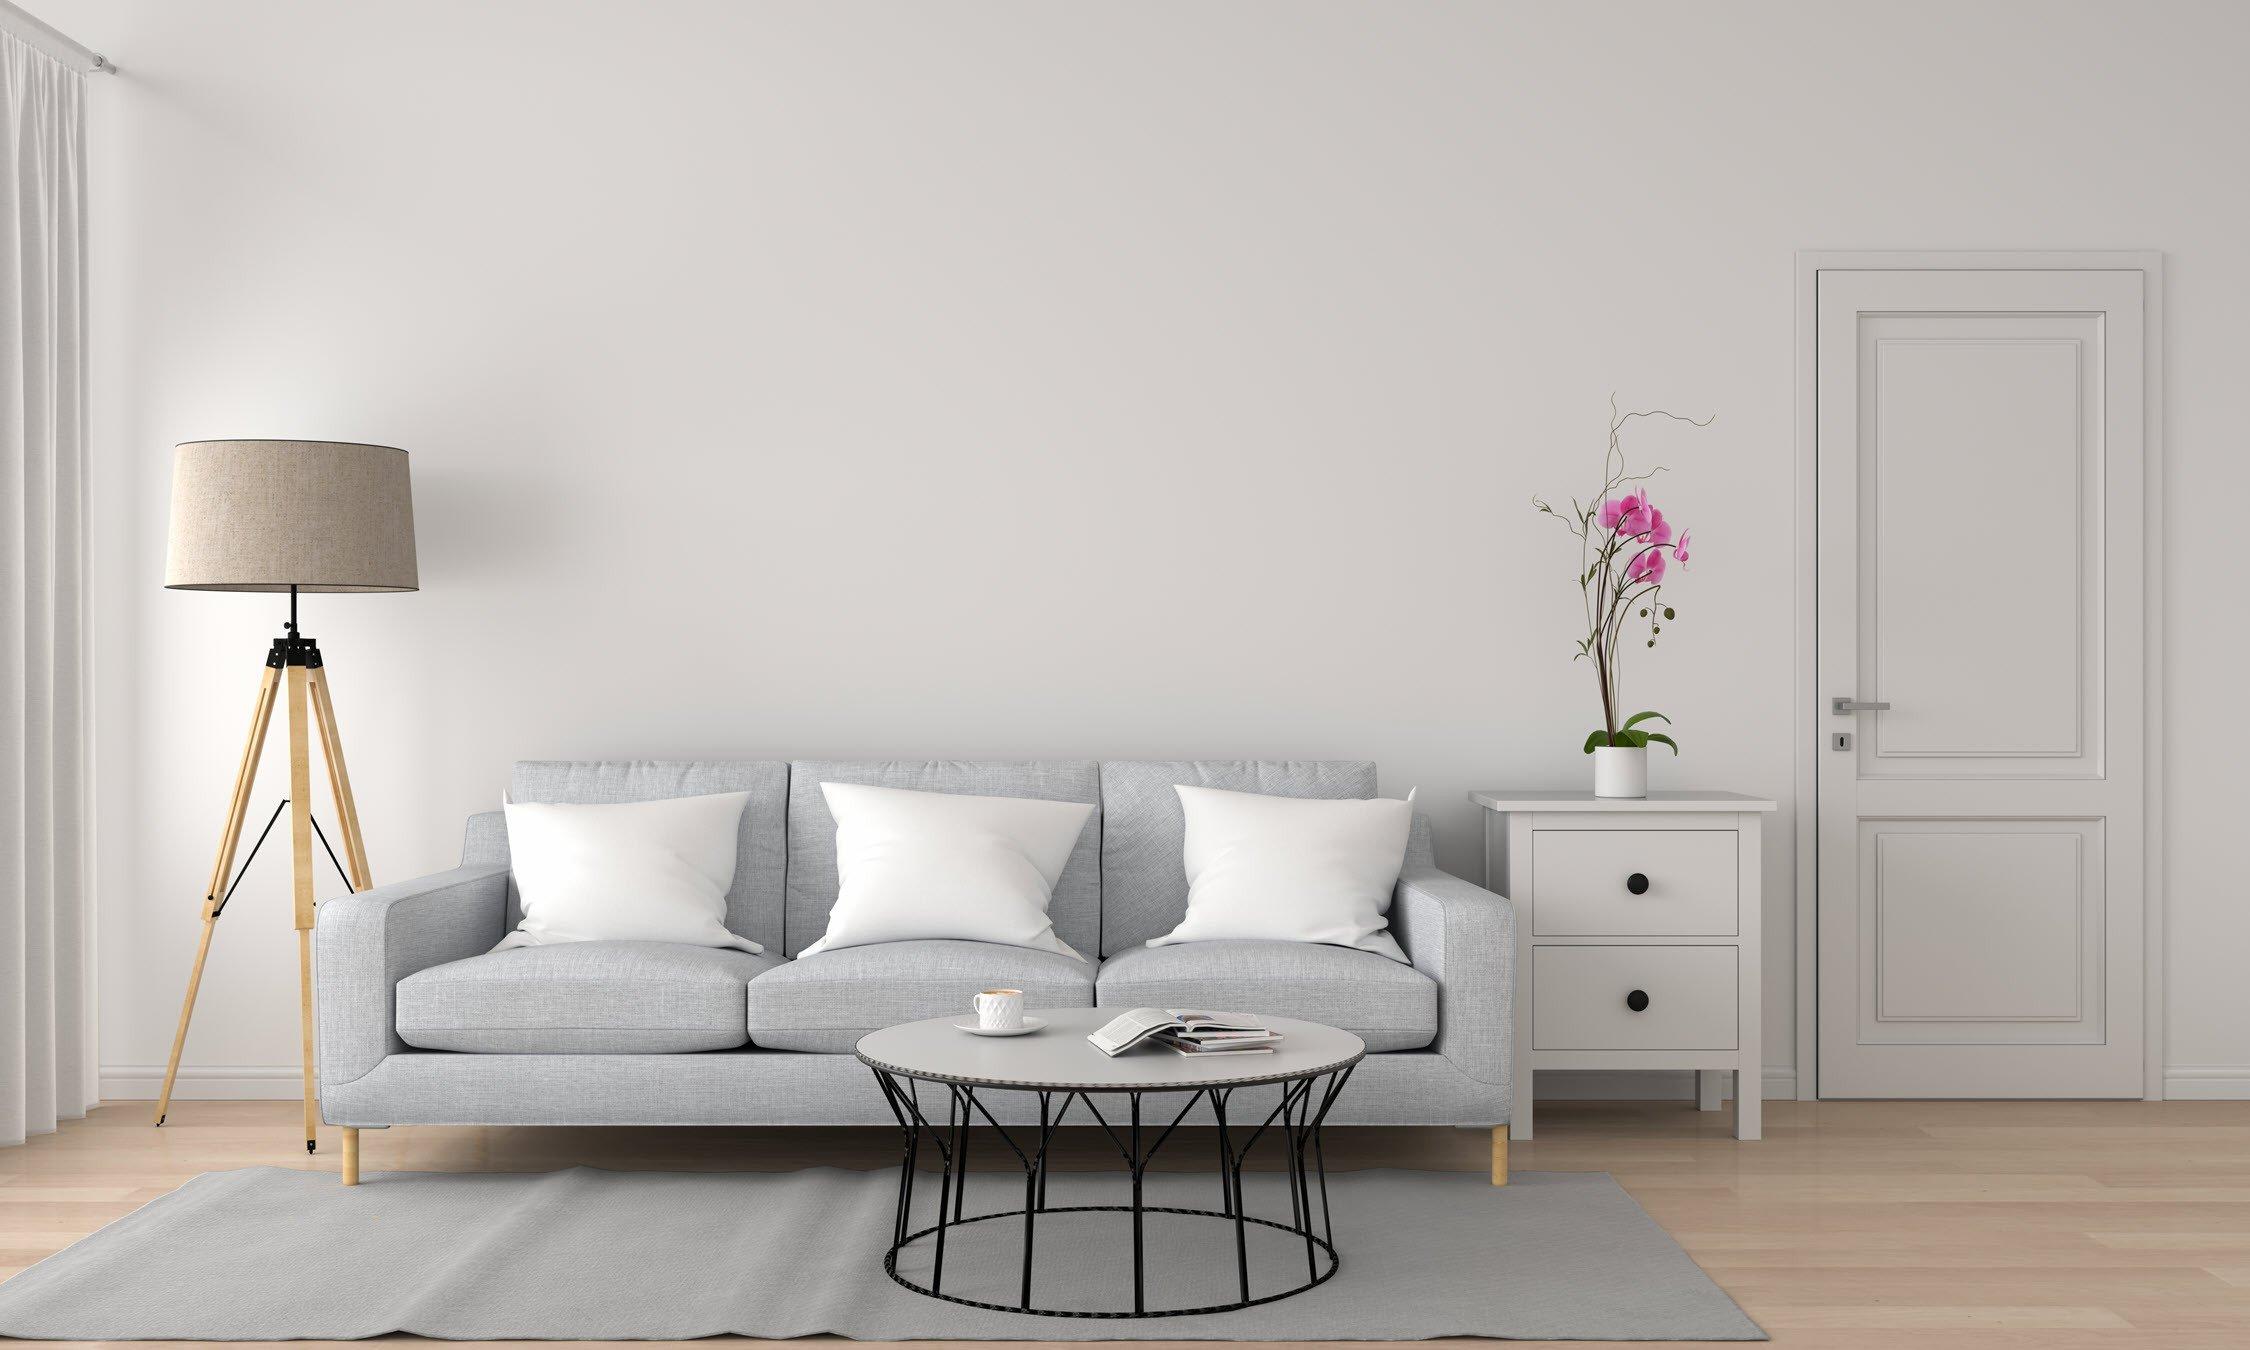 Comfortable Living Room Minimalist Beautiful How to Easily Create the Perfect Minimalist Living Room